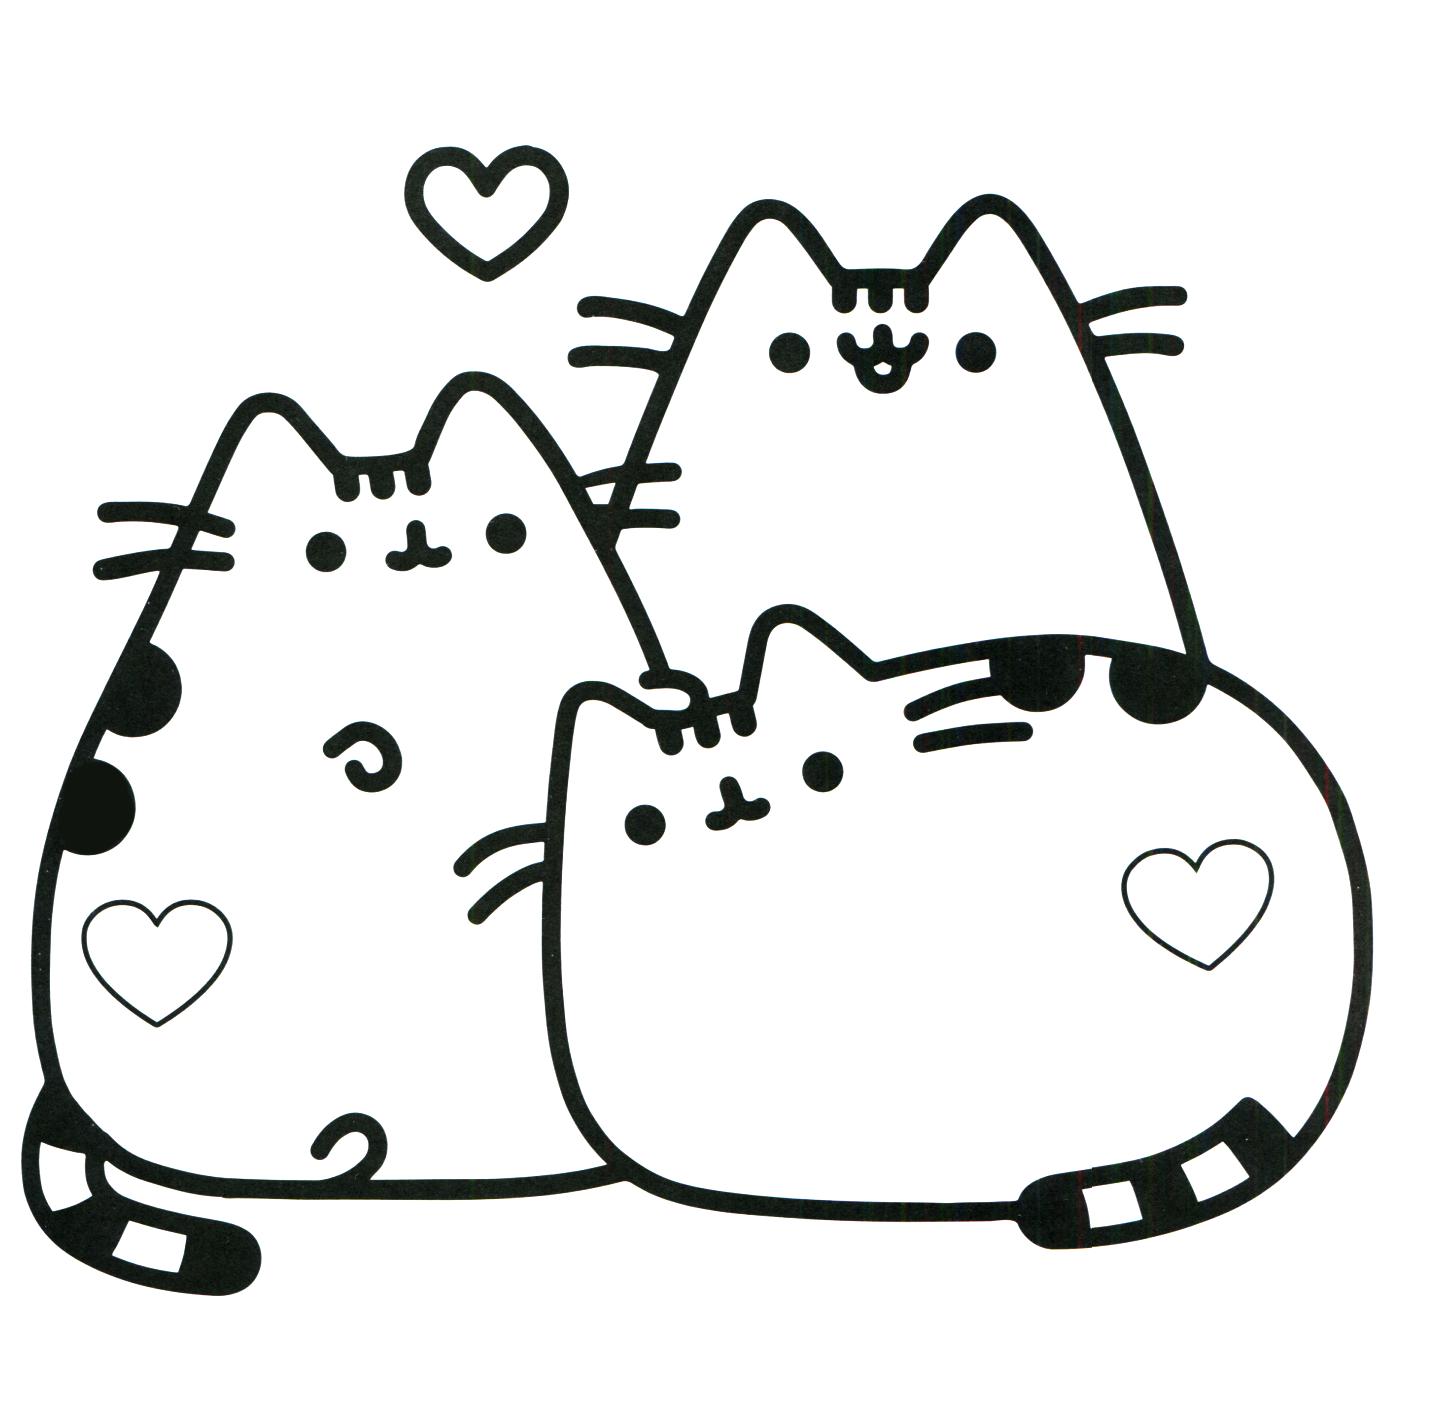 Dibujos De Pusheen Para Colorear Dibujos Para Colorear Coloreartv Com Gatito Para Colorear Dibujos Kawaii Dibujo Gato Facil